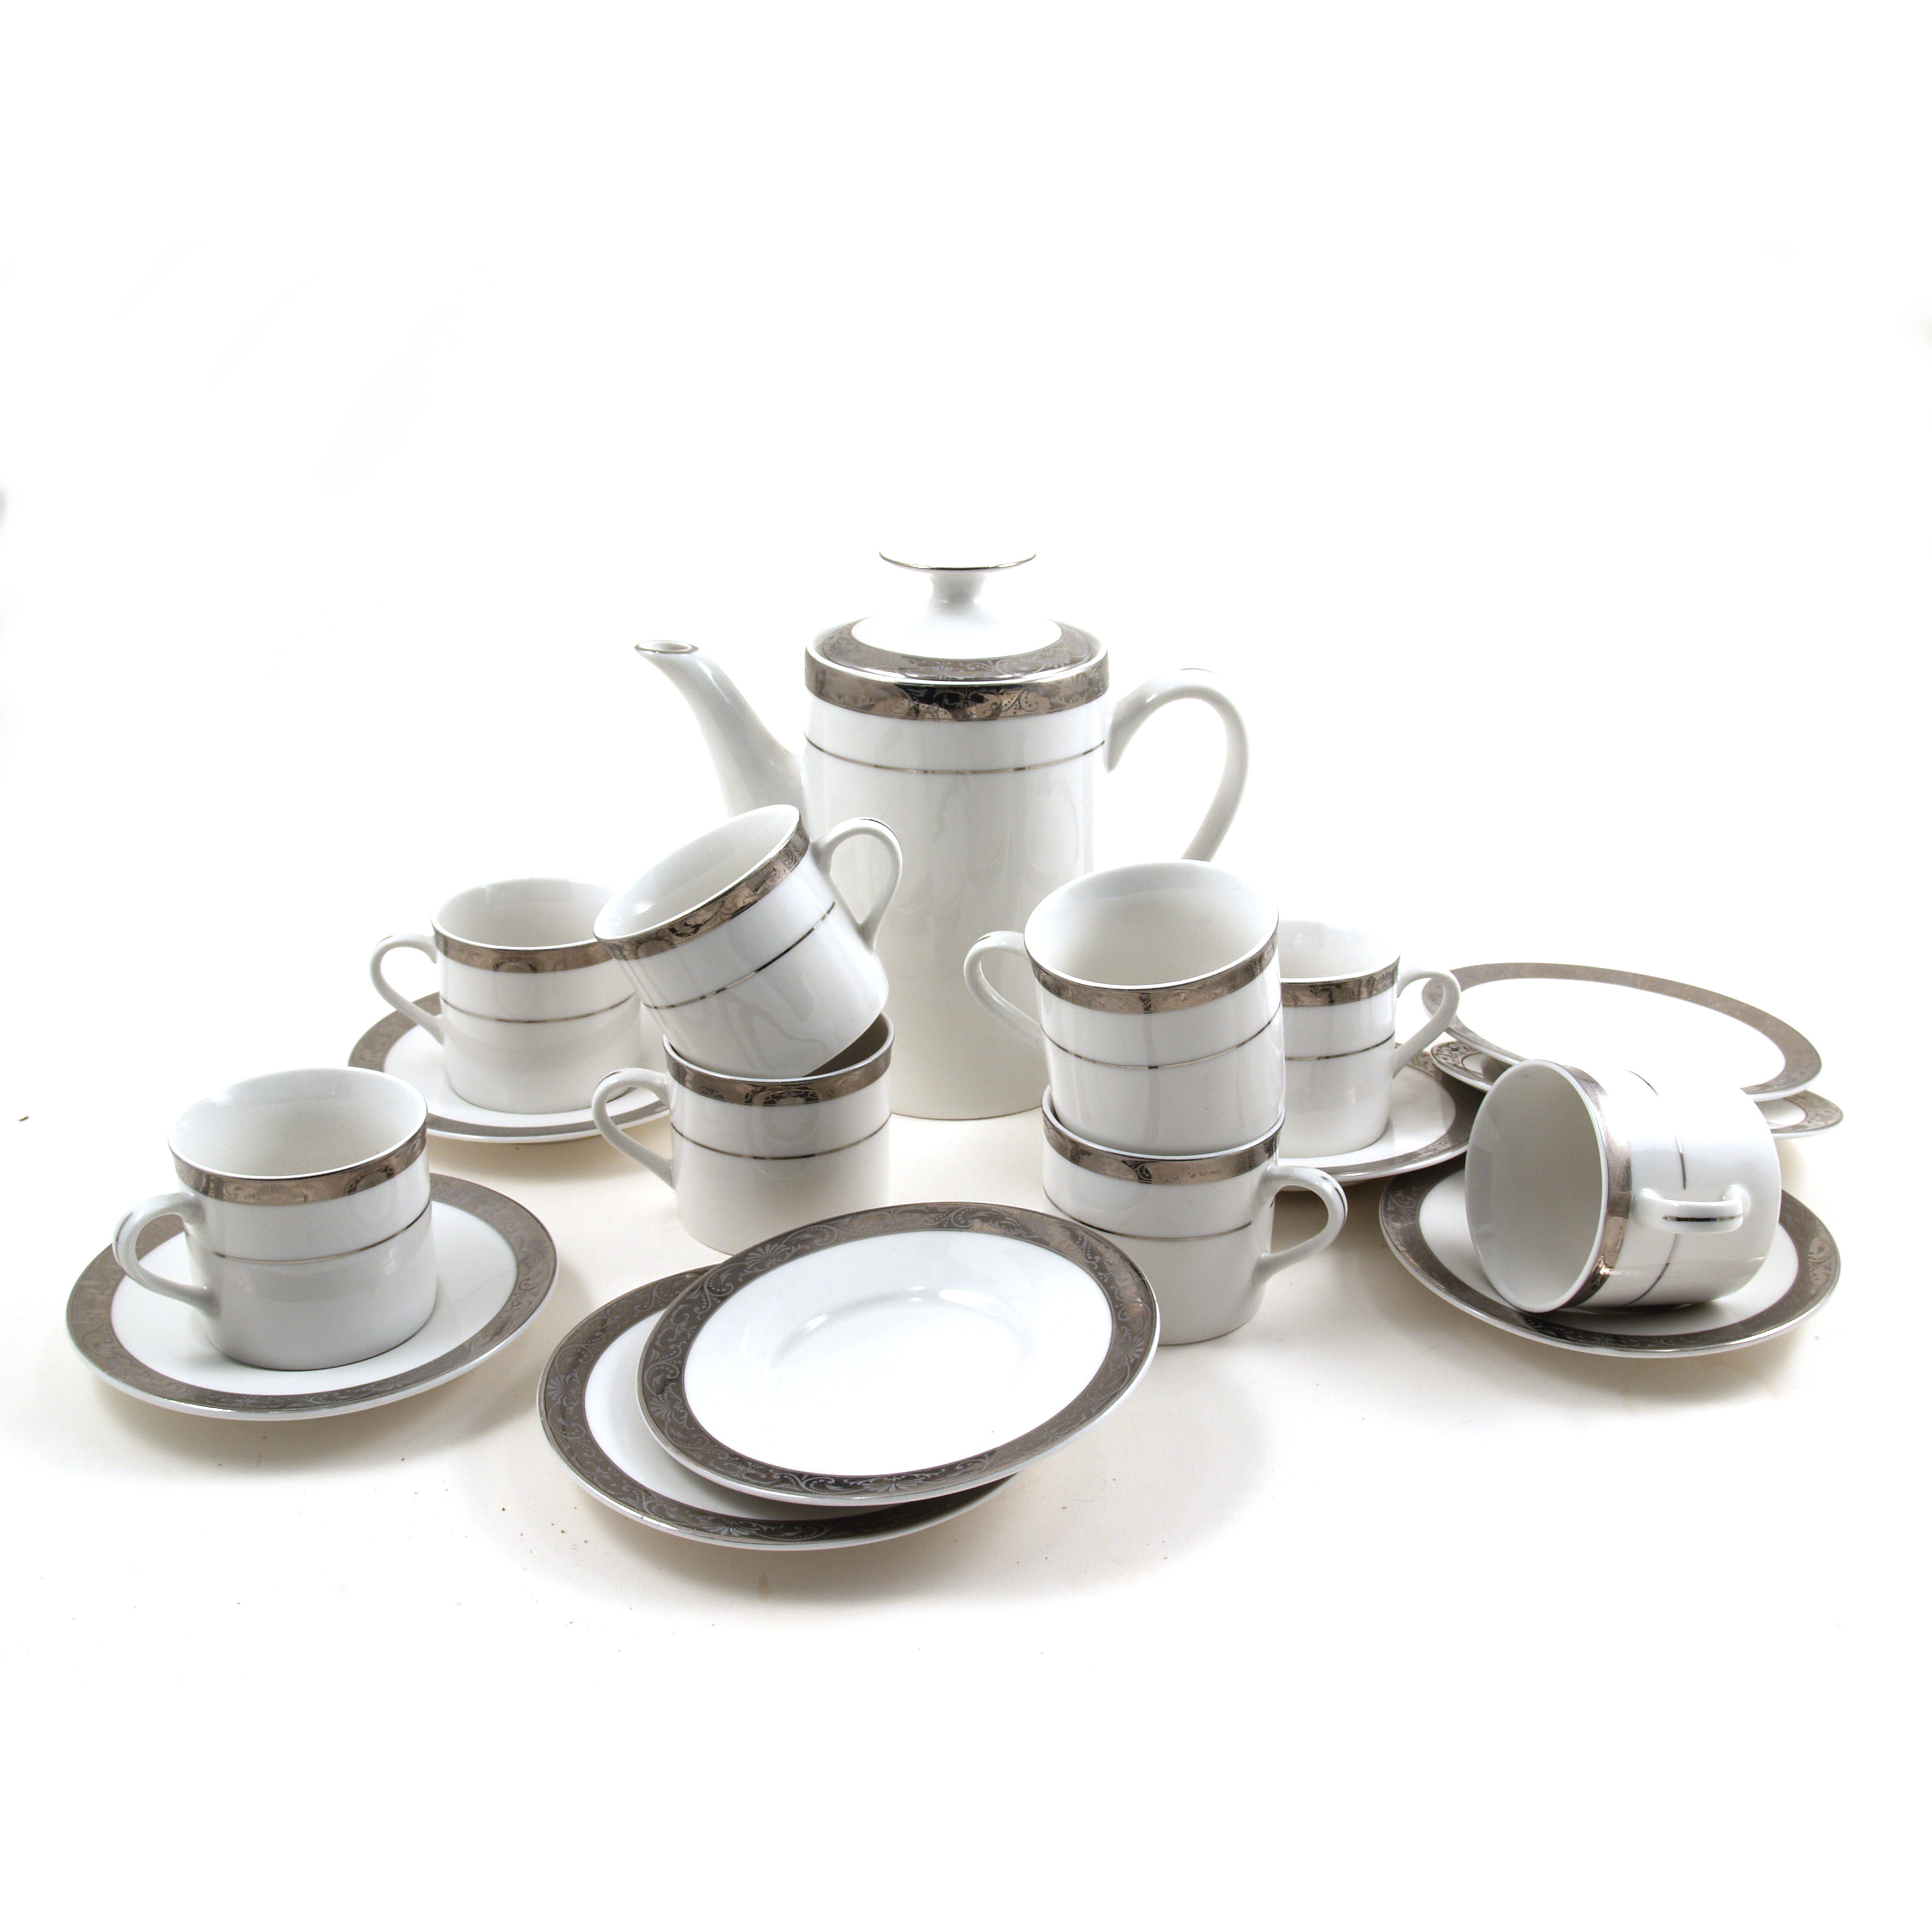 Lynns Oralia 18 Piece White and Silver Porcelain Espresso Set, Service for 8